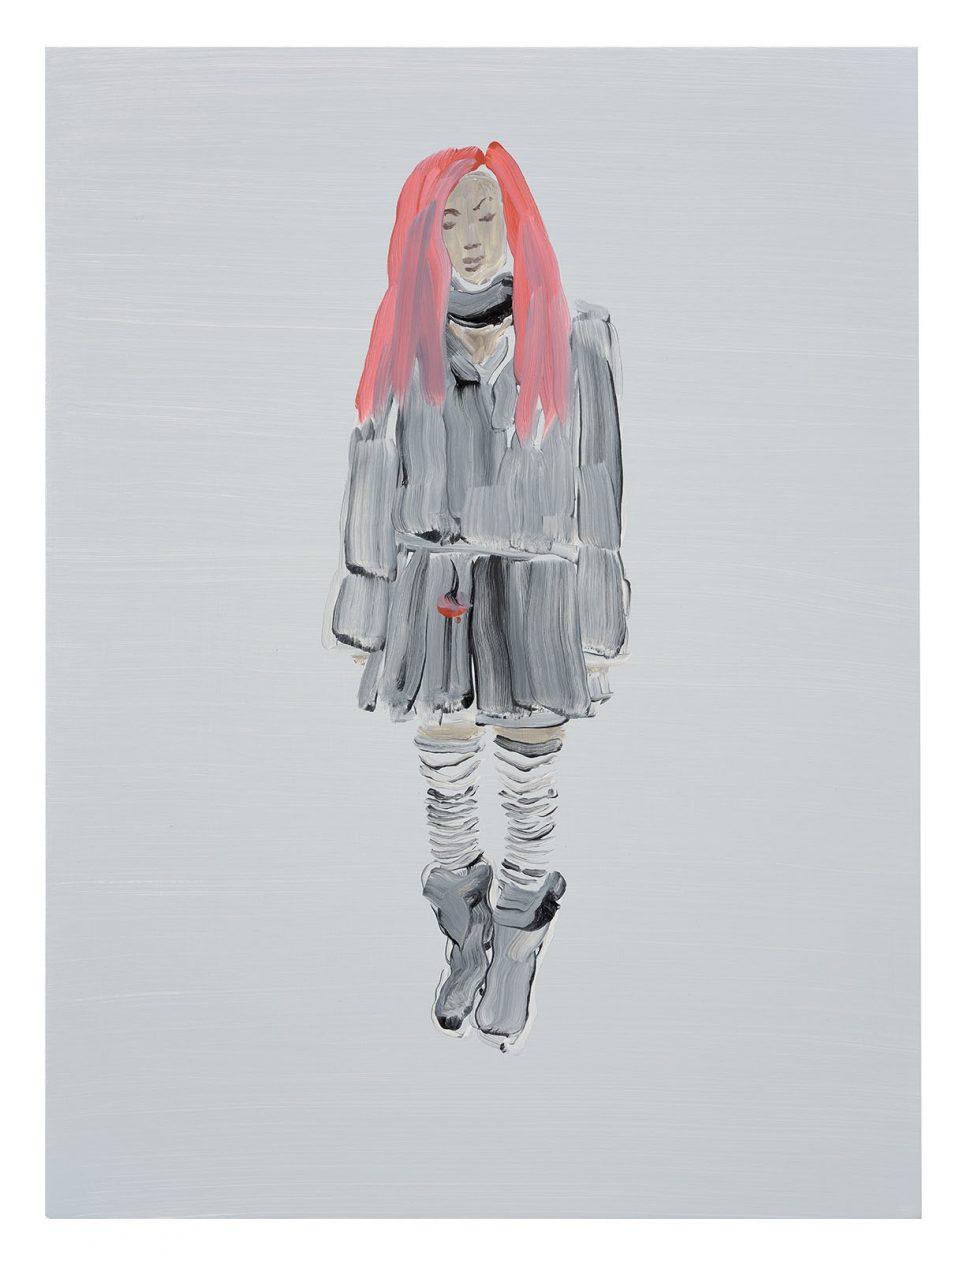 Goth with Ruby Hair - Oil on board 2016: 40x30cm